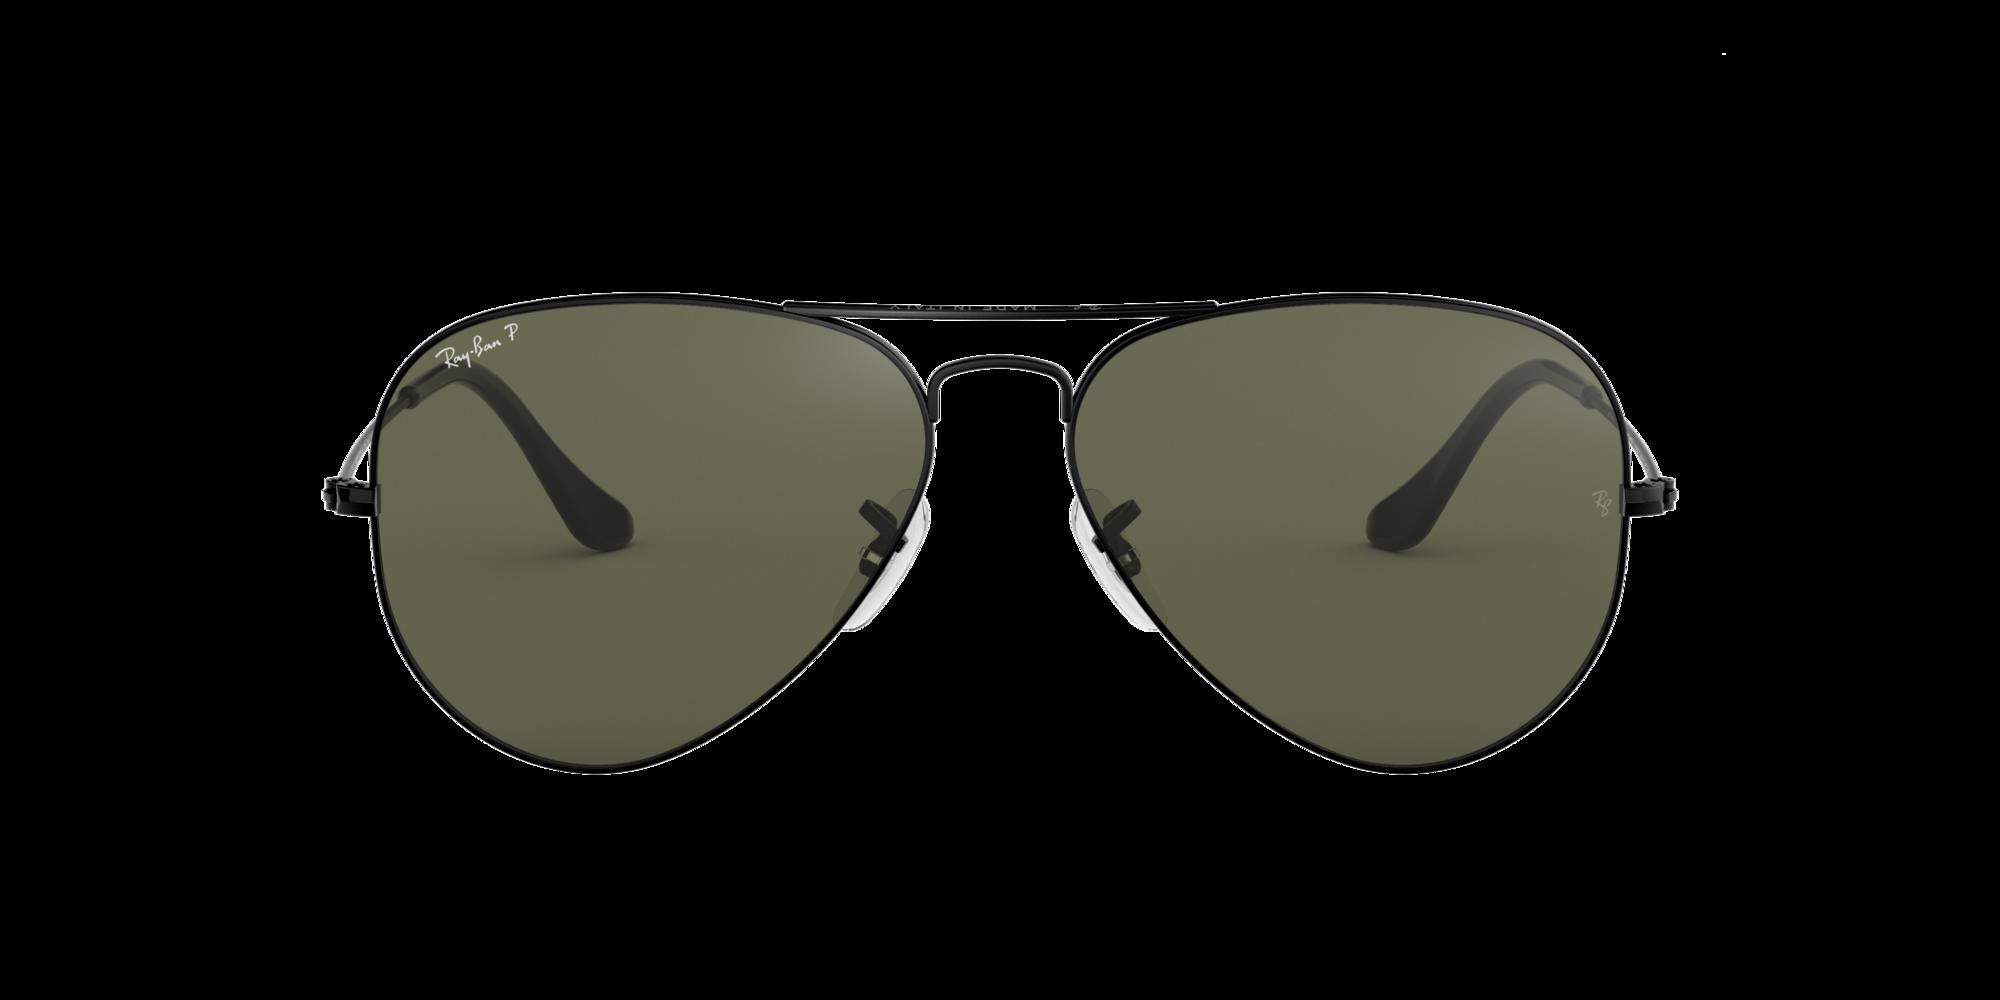 Image for RB3025 62 AVIATOR LARGE METAL from LensCrafters | Glasses, Prescription Glasses Online, Eyewear